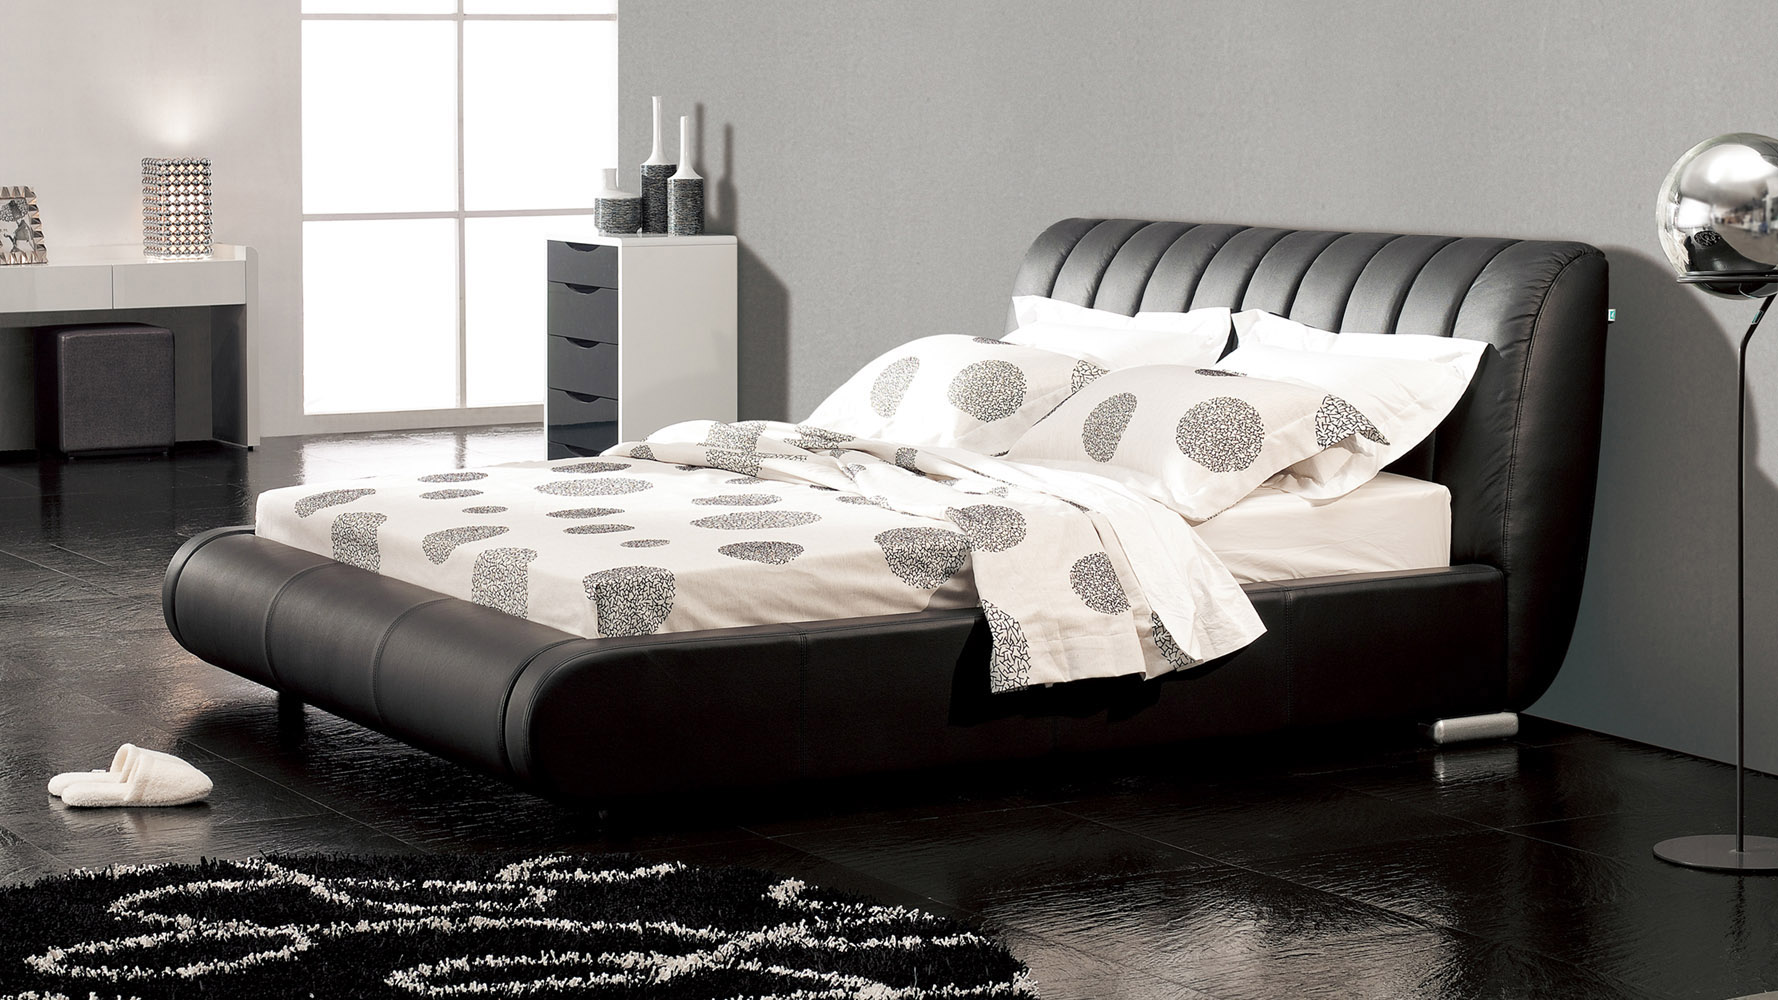 Modern Bedroom Furniture & Accents - Contemporary Bedroom | Zuri ...